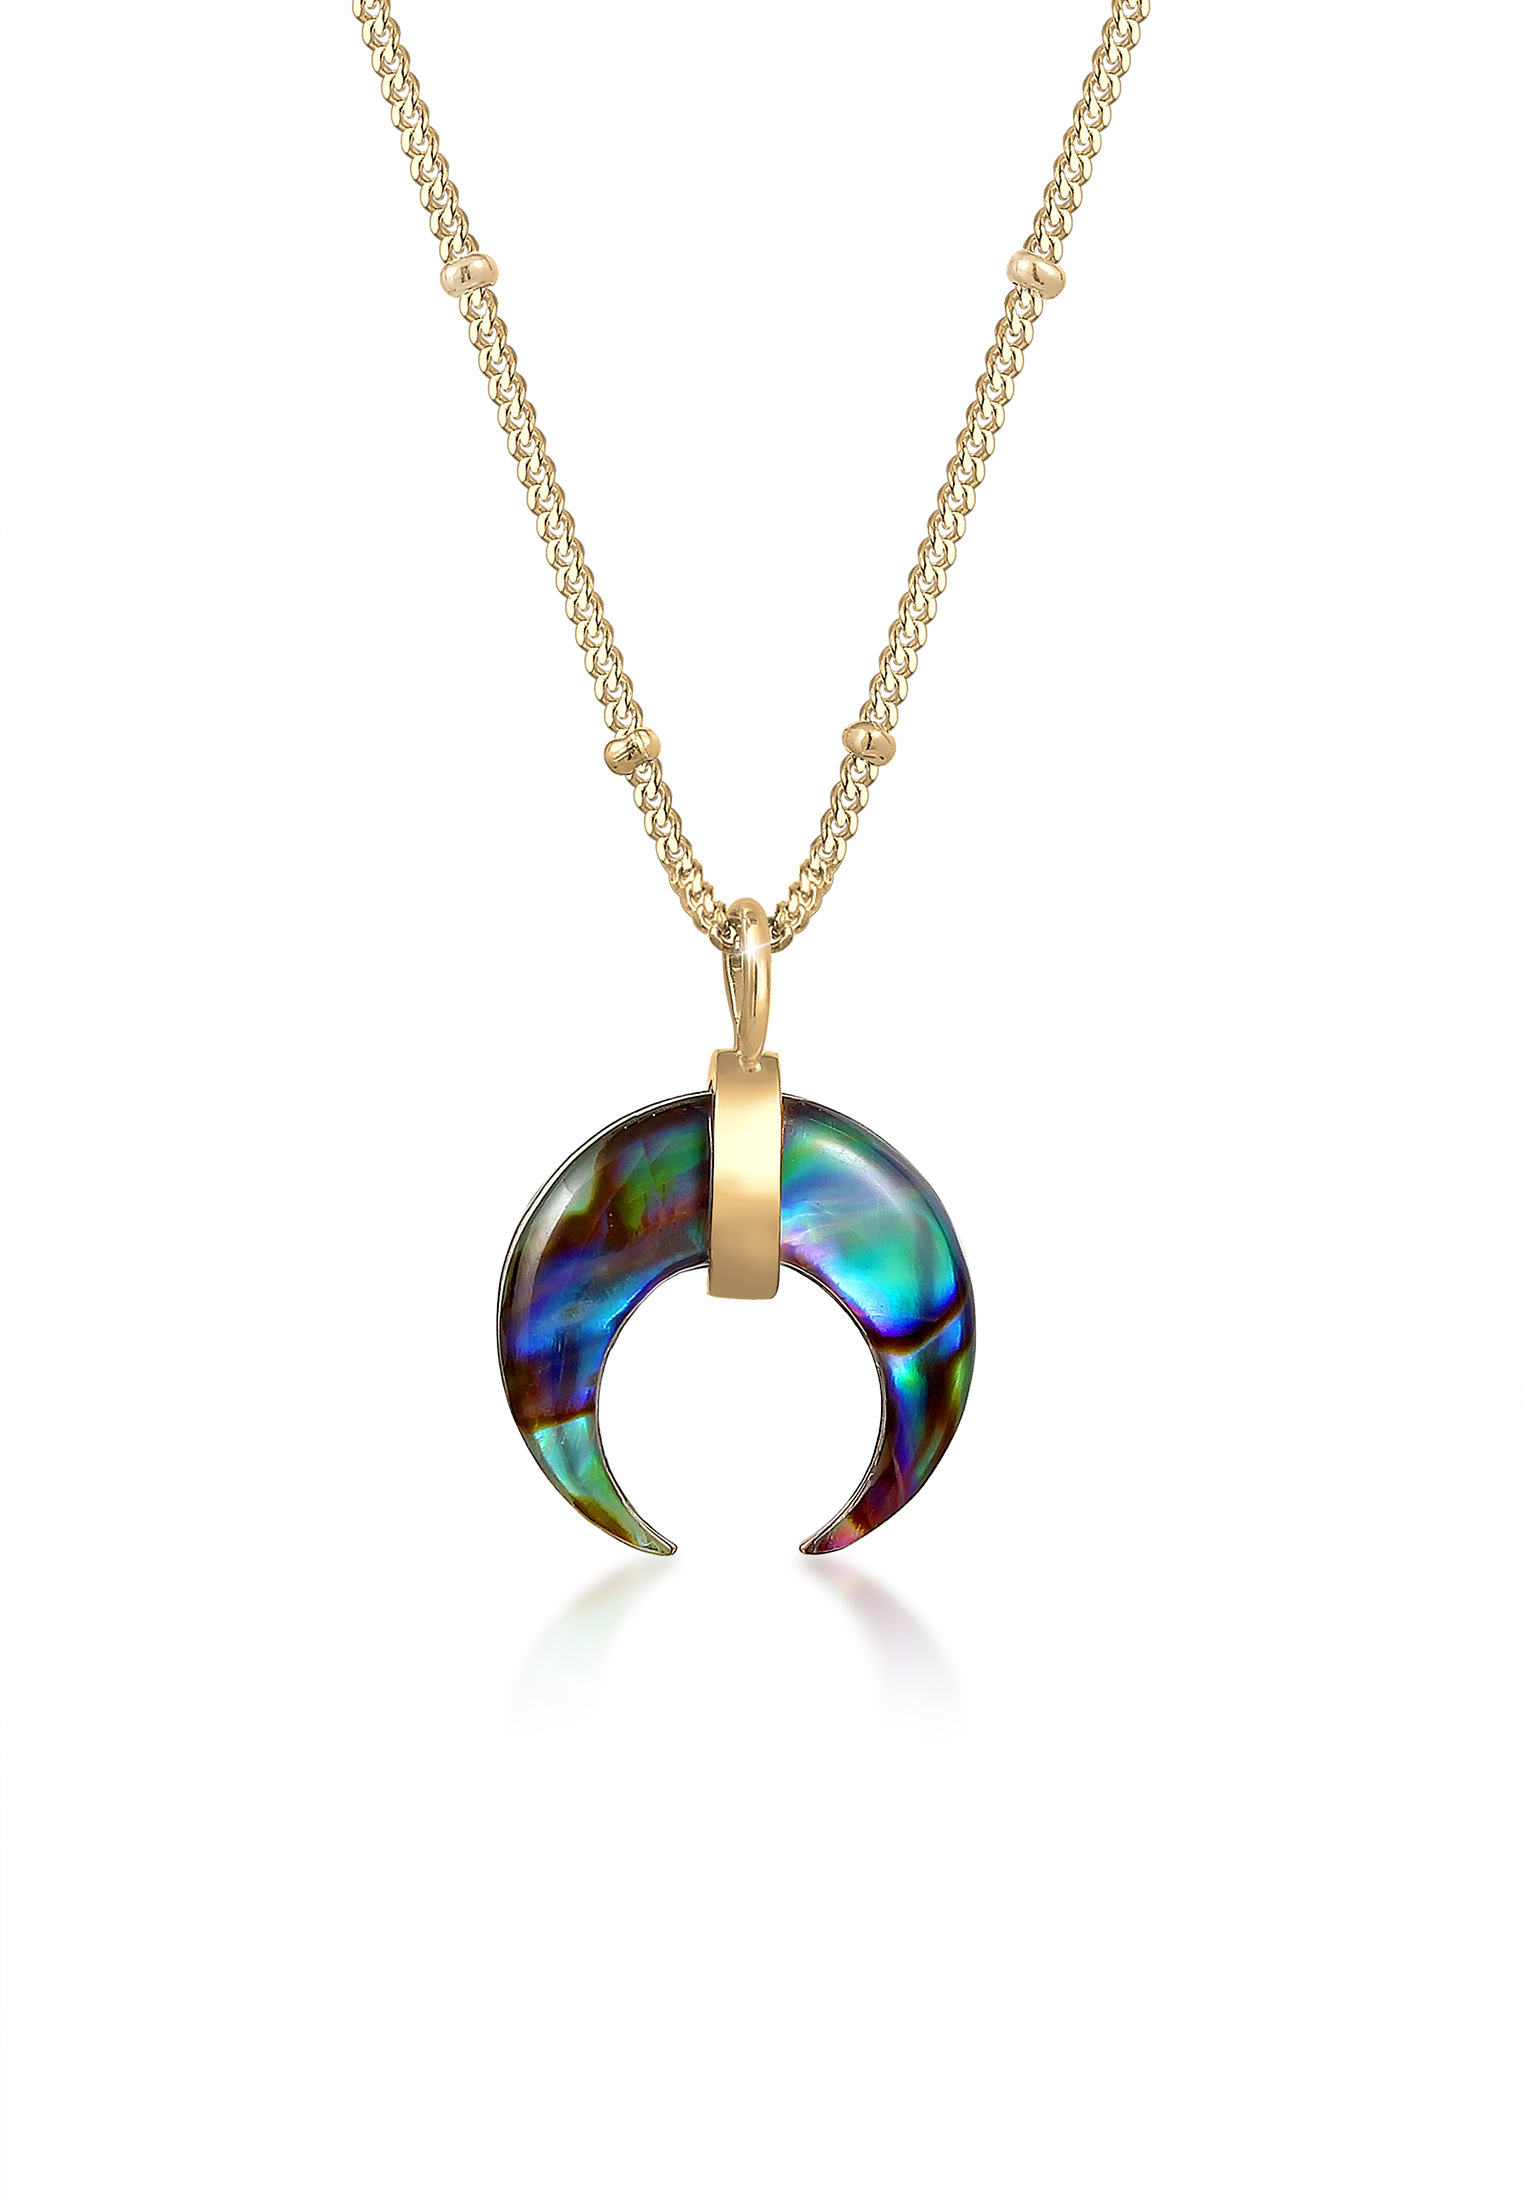 Kugel-Halskette Astro   Perle   925 Sterling Silber vergoldet